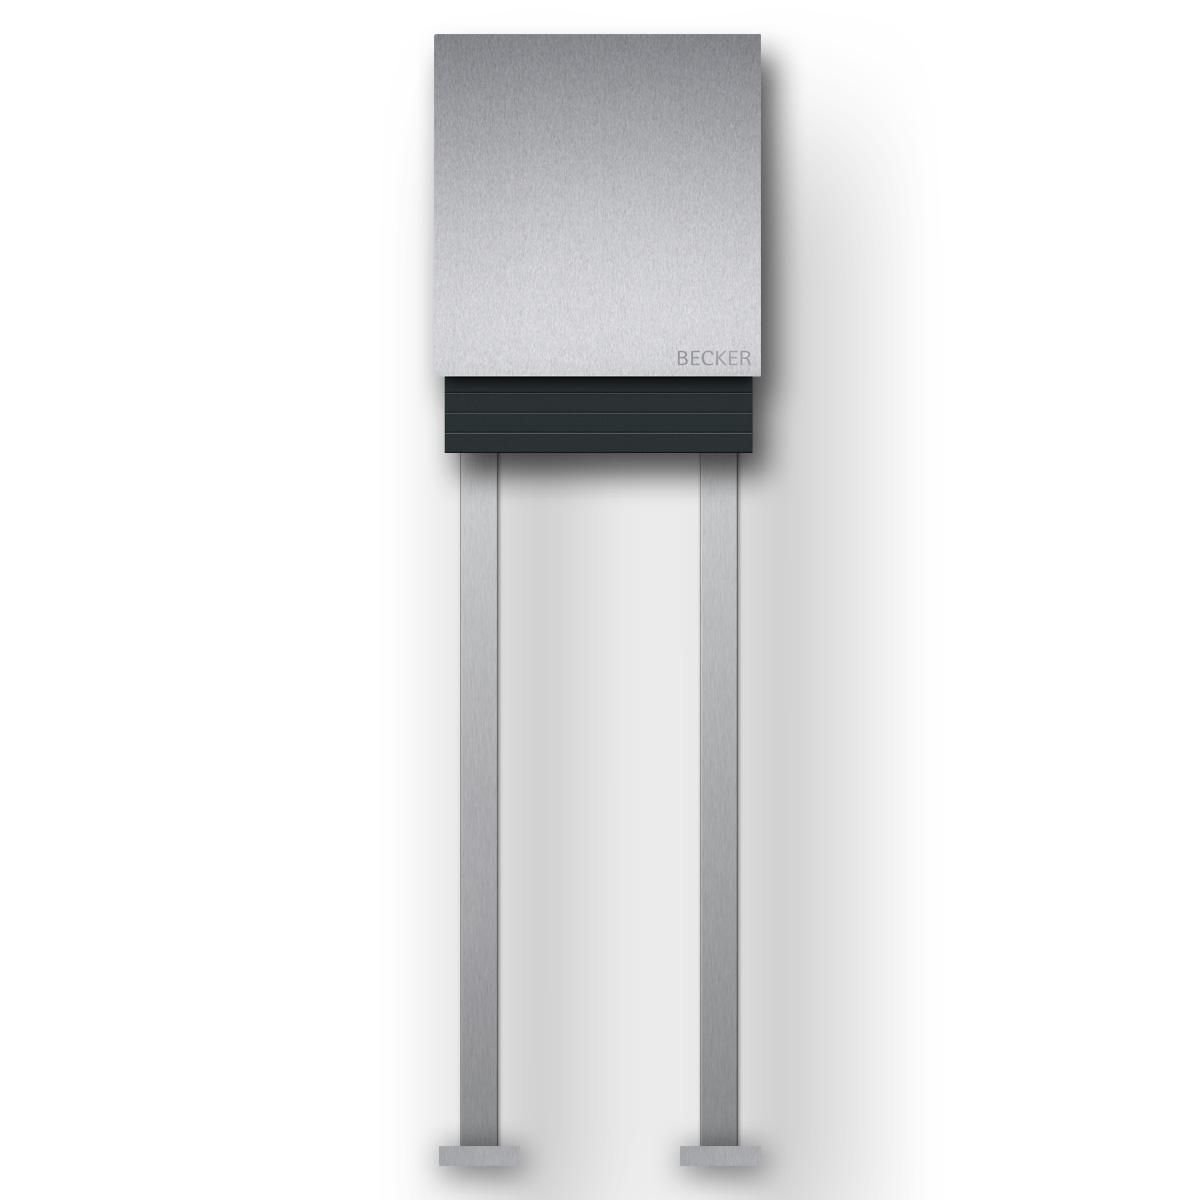 briefkasten edelstahl b1 light freistehend z e. Black Bedroom Furniture Sets. Home Design Ideas